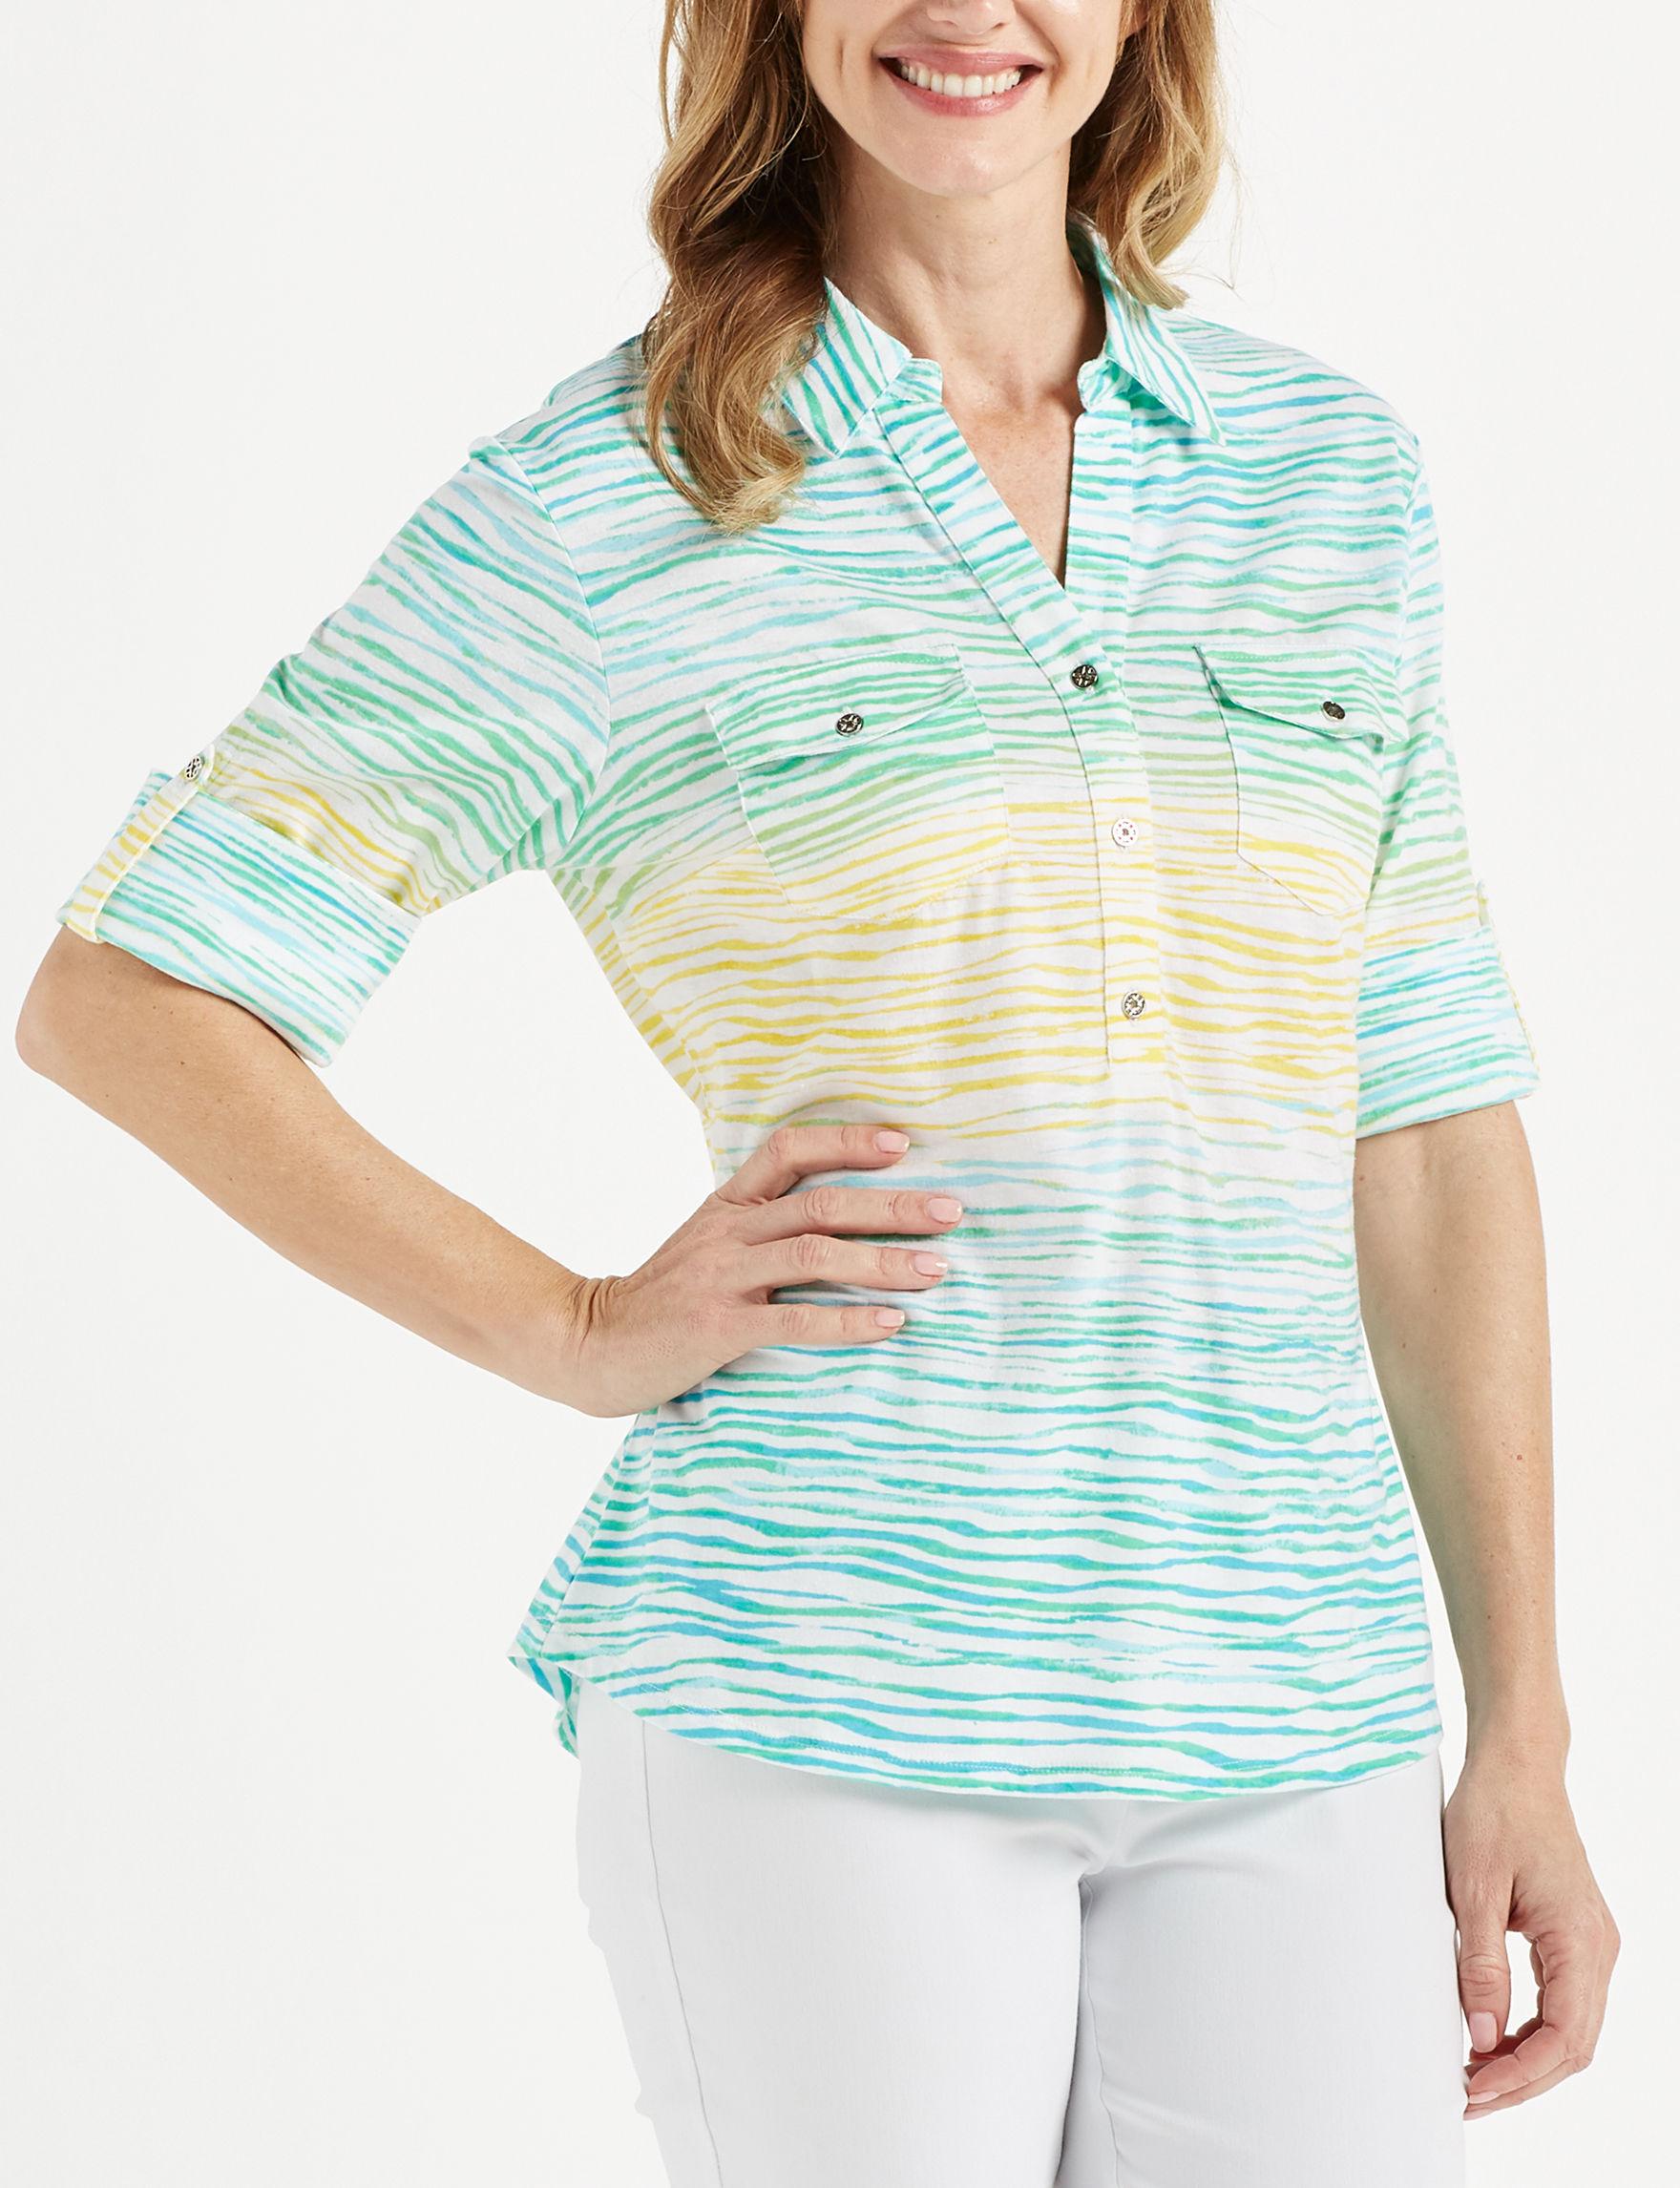 Rebecca Malone Turquoise Multi Shirts & Blouses